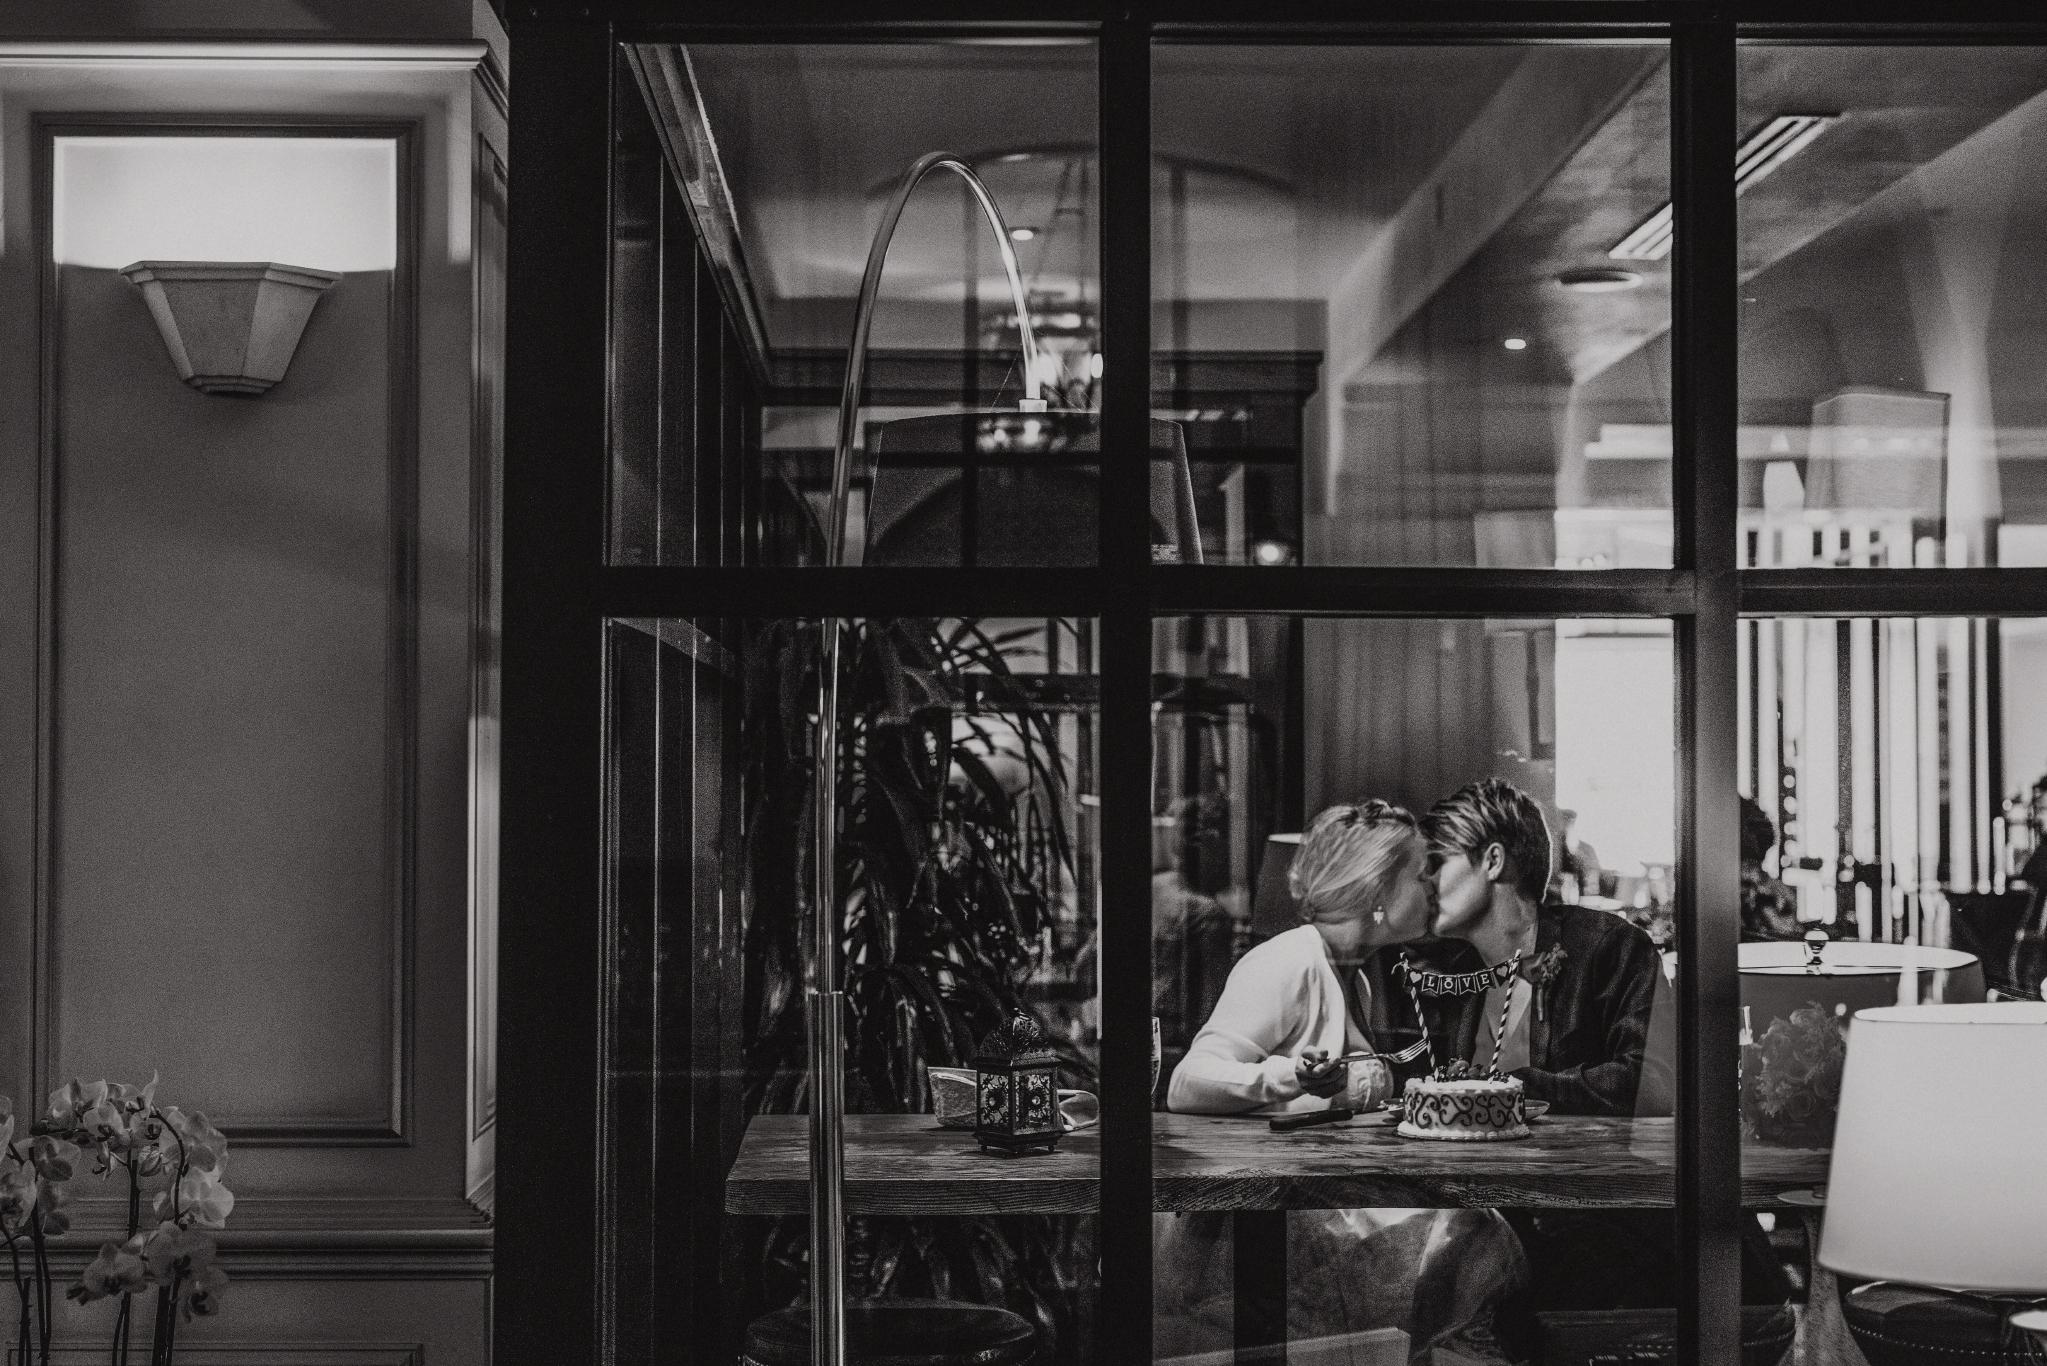 san diego wedding   photographer   monotone shot of women kissing seen through window panel